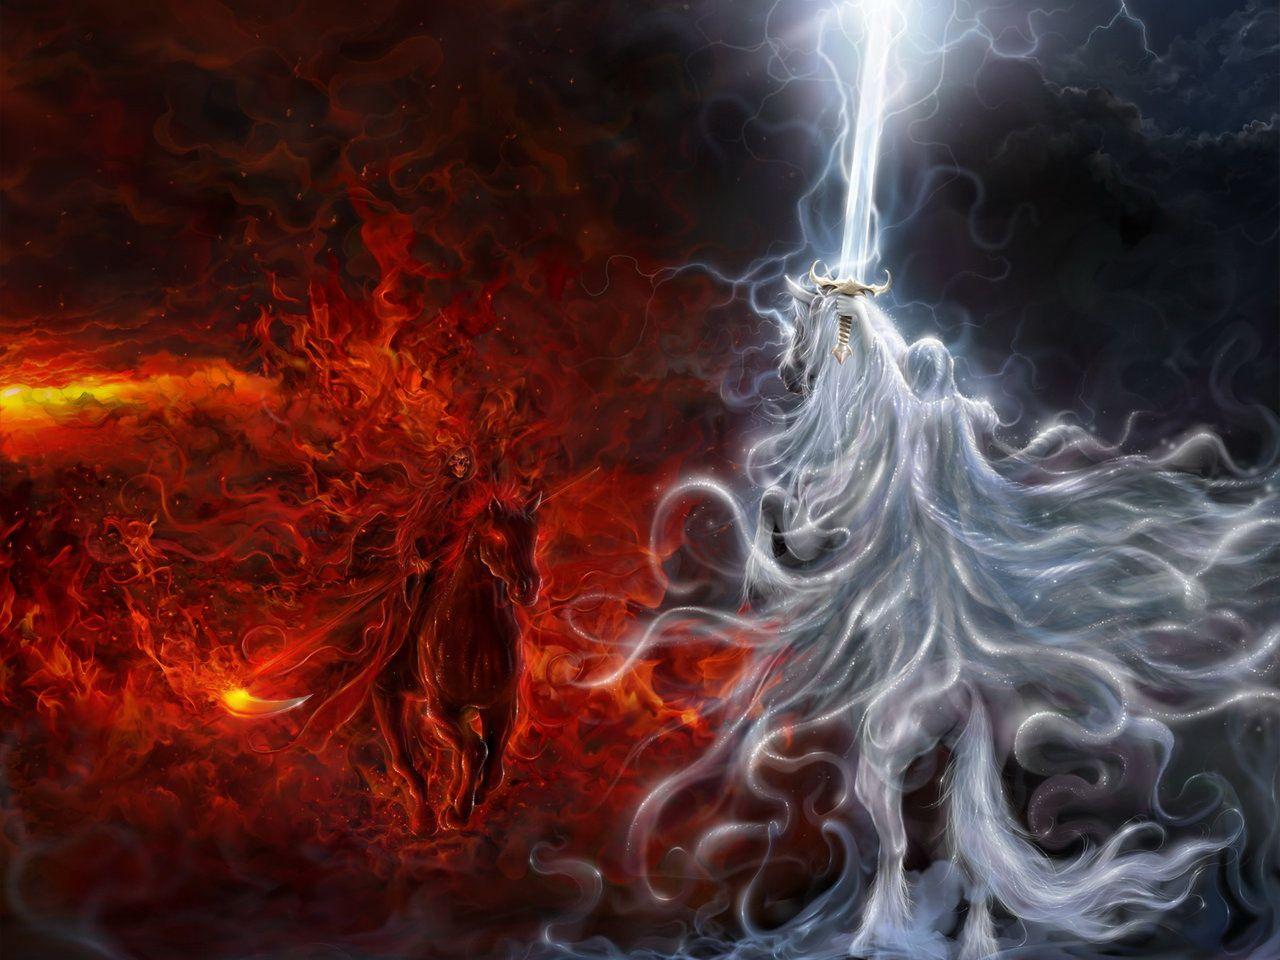 Cool Wallpaper Horse Lightning - 5175765537a88c0502332810b4b5927f  Trends_759834.jpg